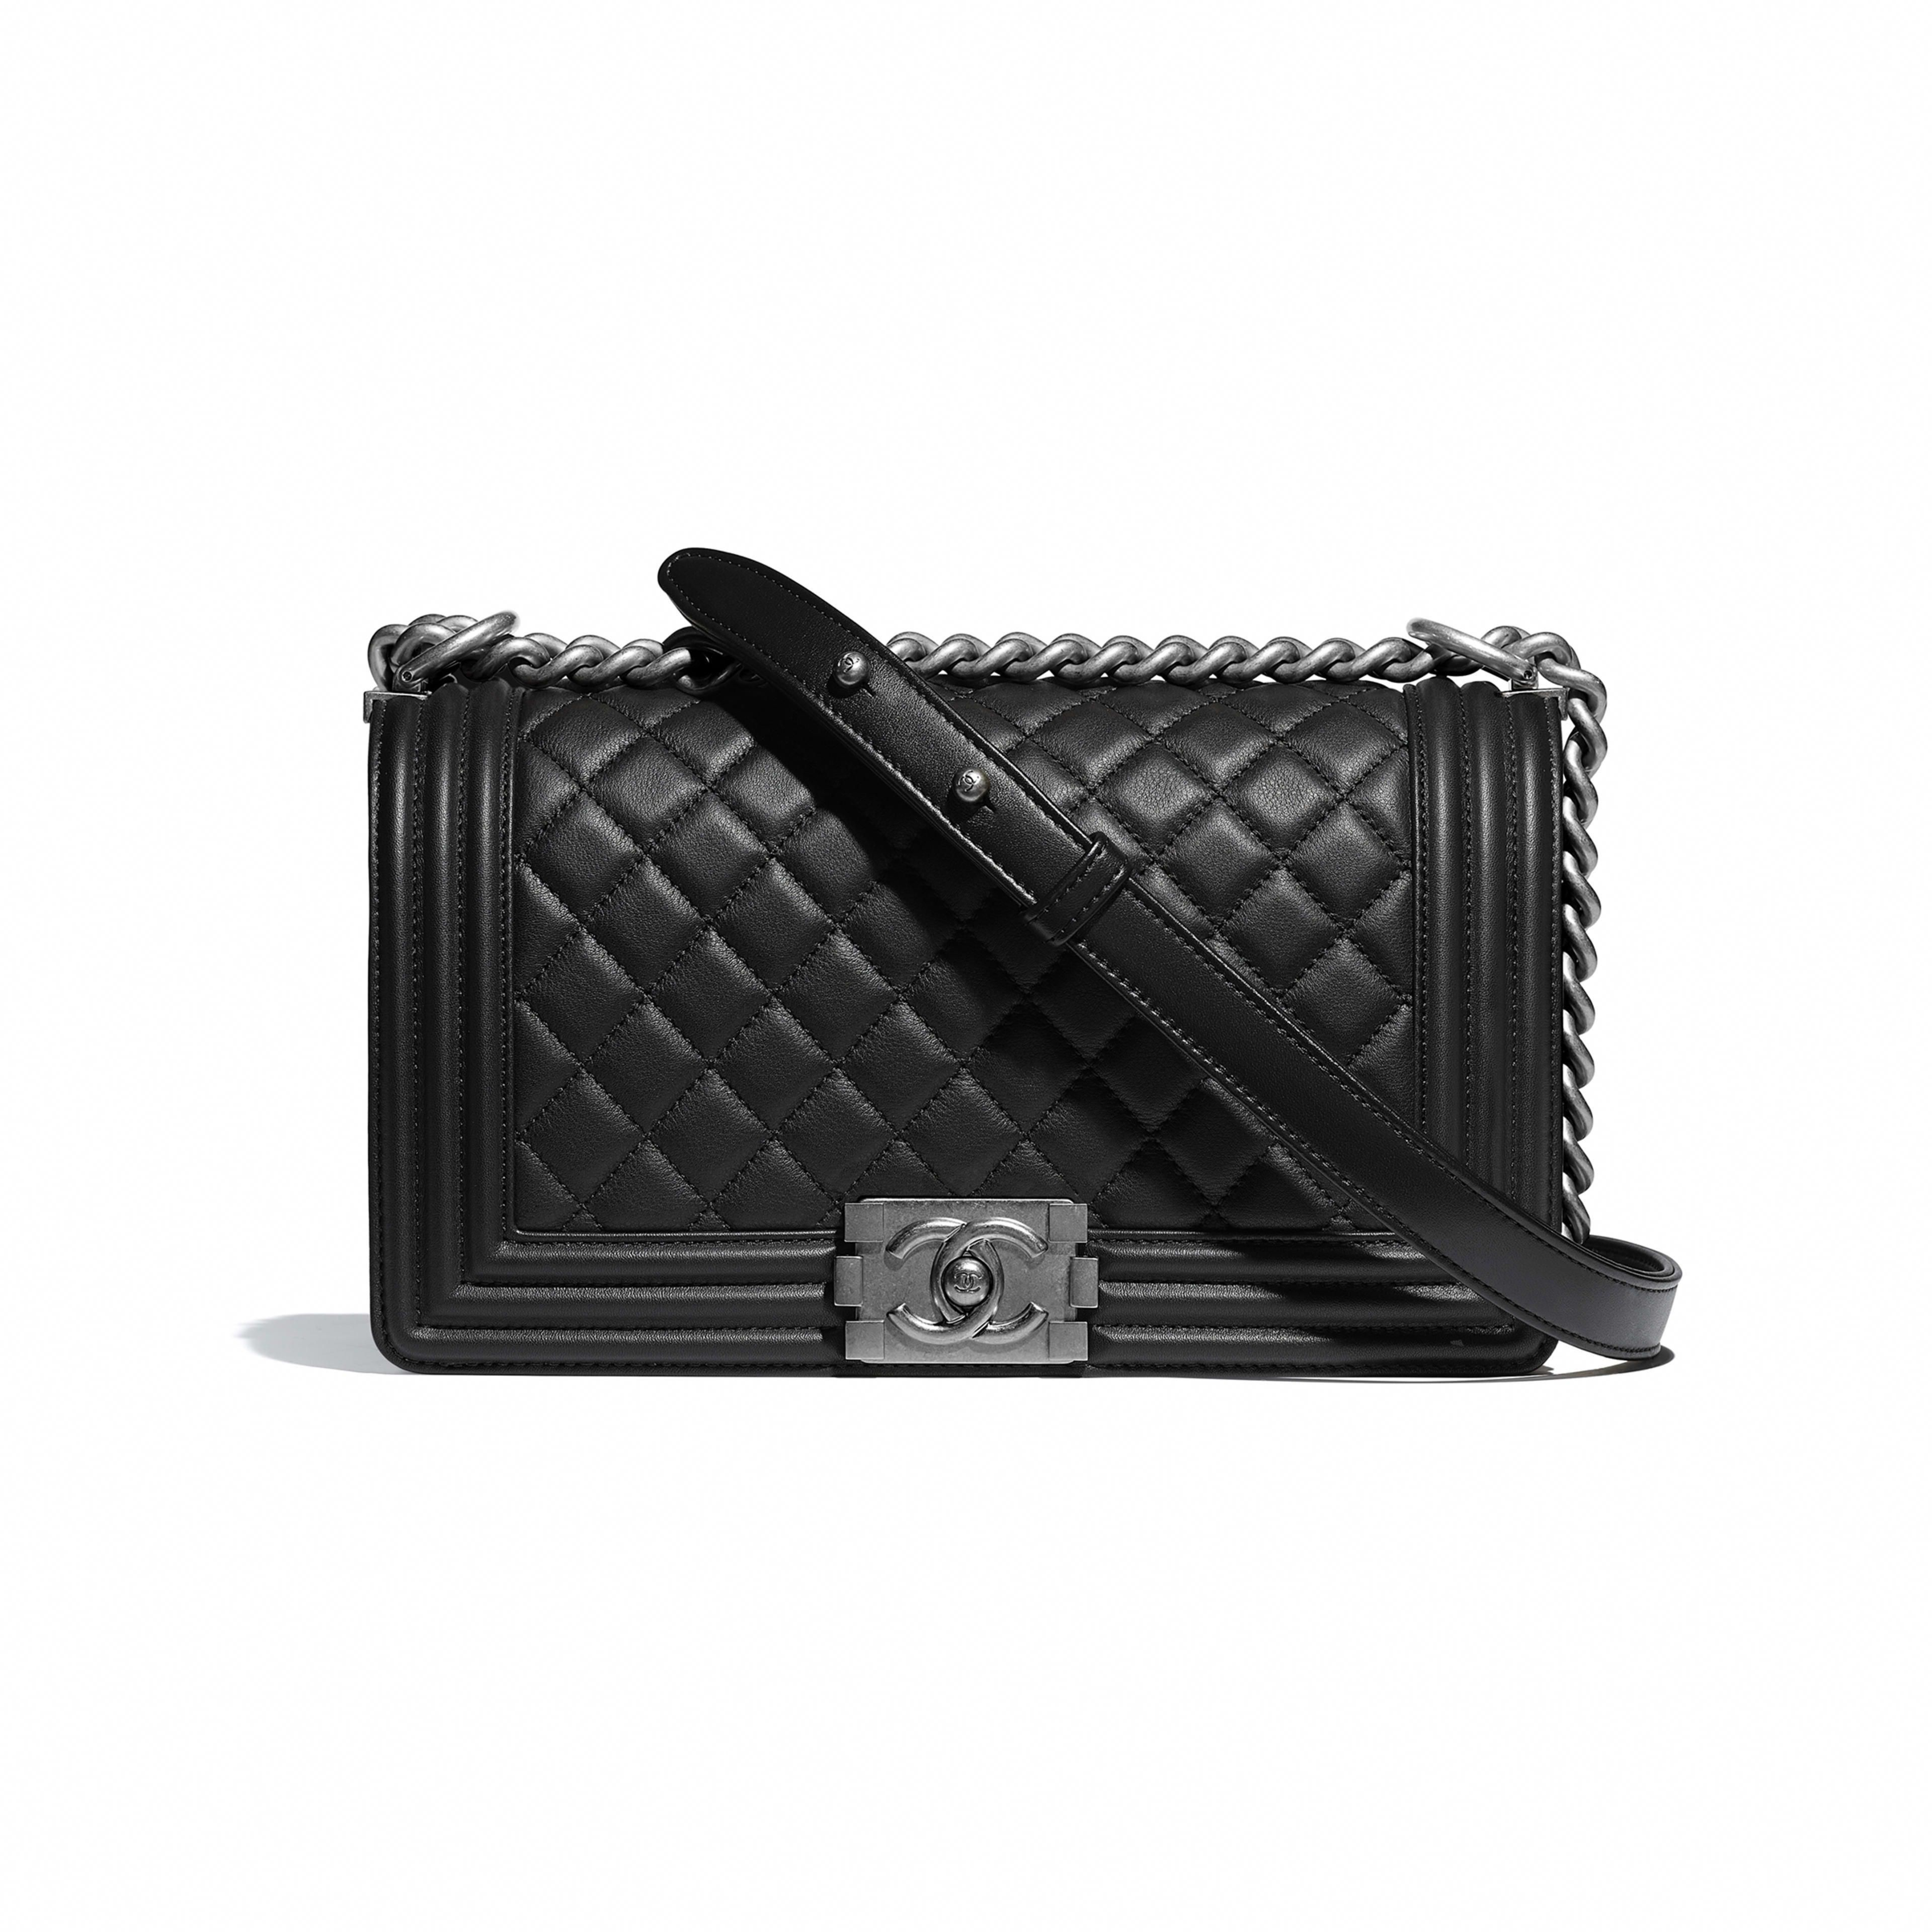 763da308c94d Chanel Boy 2017 New Medium Flap Crossbody Black Lambskin Leather Shoulder  Bag